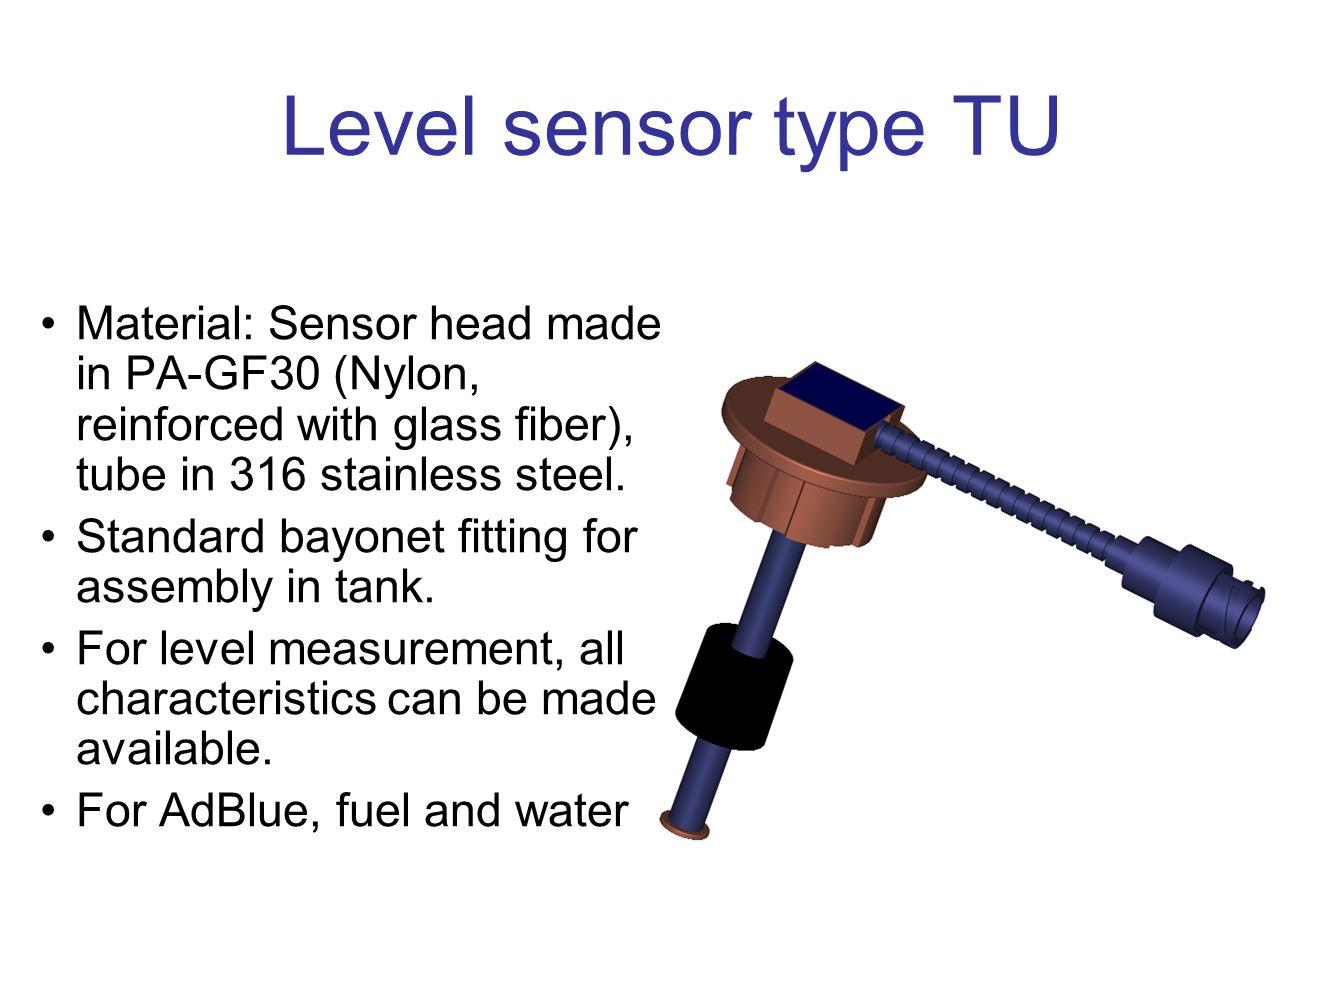 Level sensor type TU Material: Sensor head made in PA-GF30 (Nylon, reinforced with glass fiber), tube in 316 stainless steel.